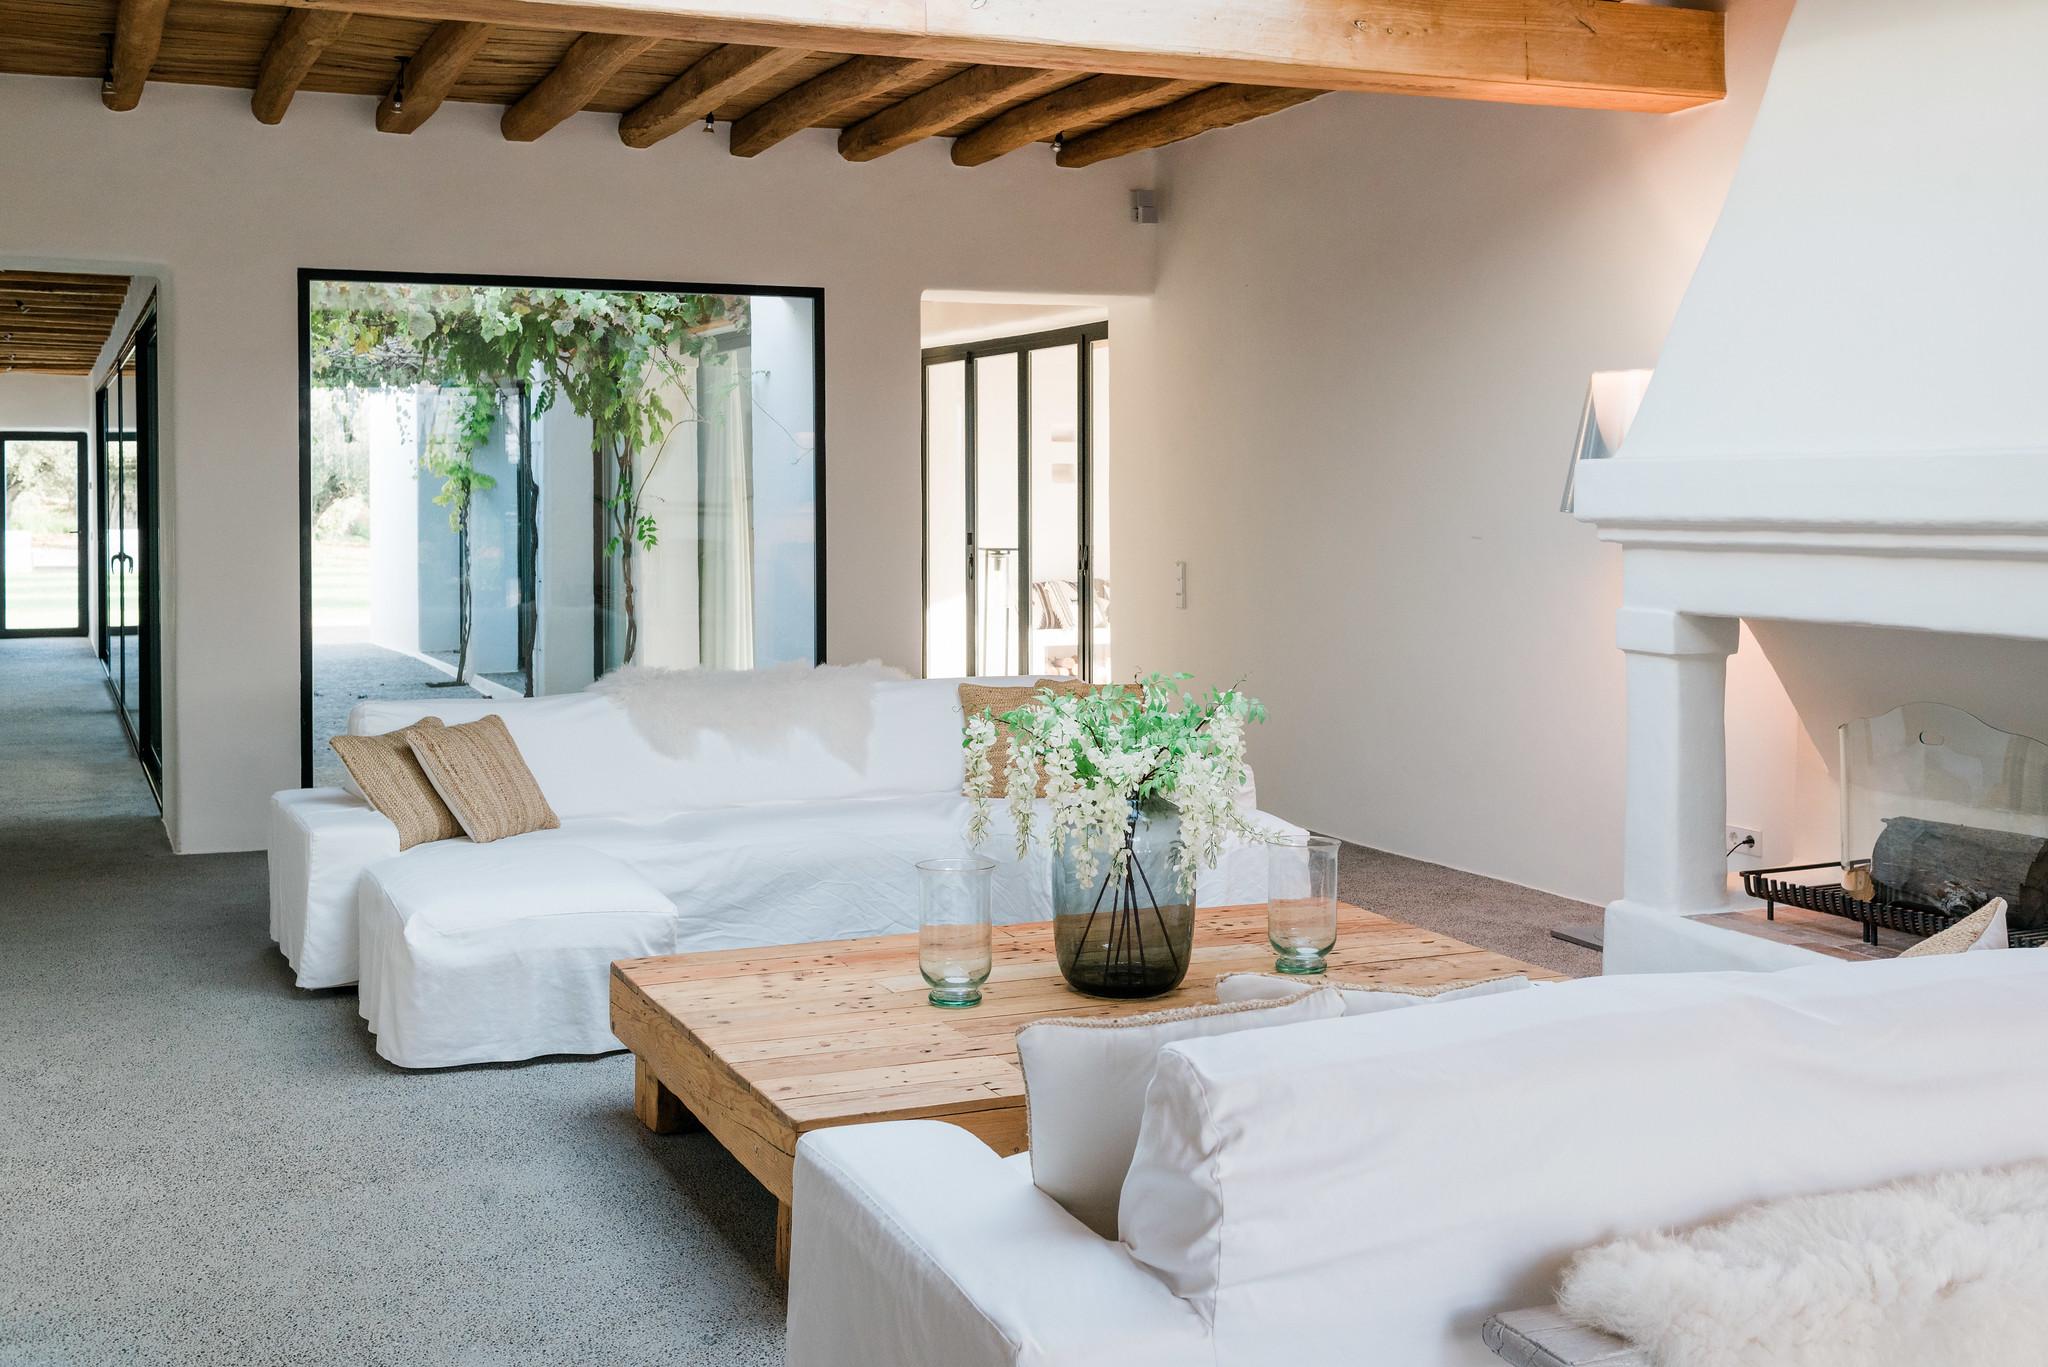 https://www.white-ibiza.com/wp-content/uploads/2020/05/white-ibiza-villas-can-terra-living-room-1.jpg